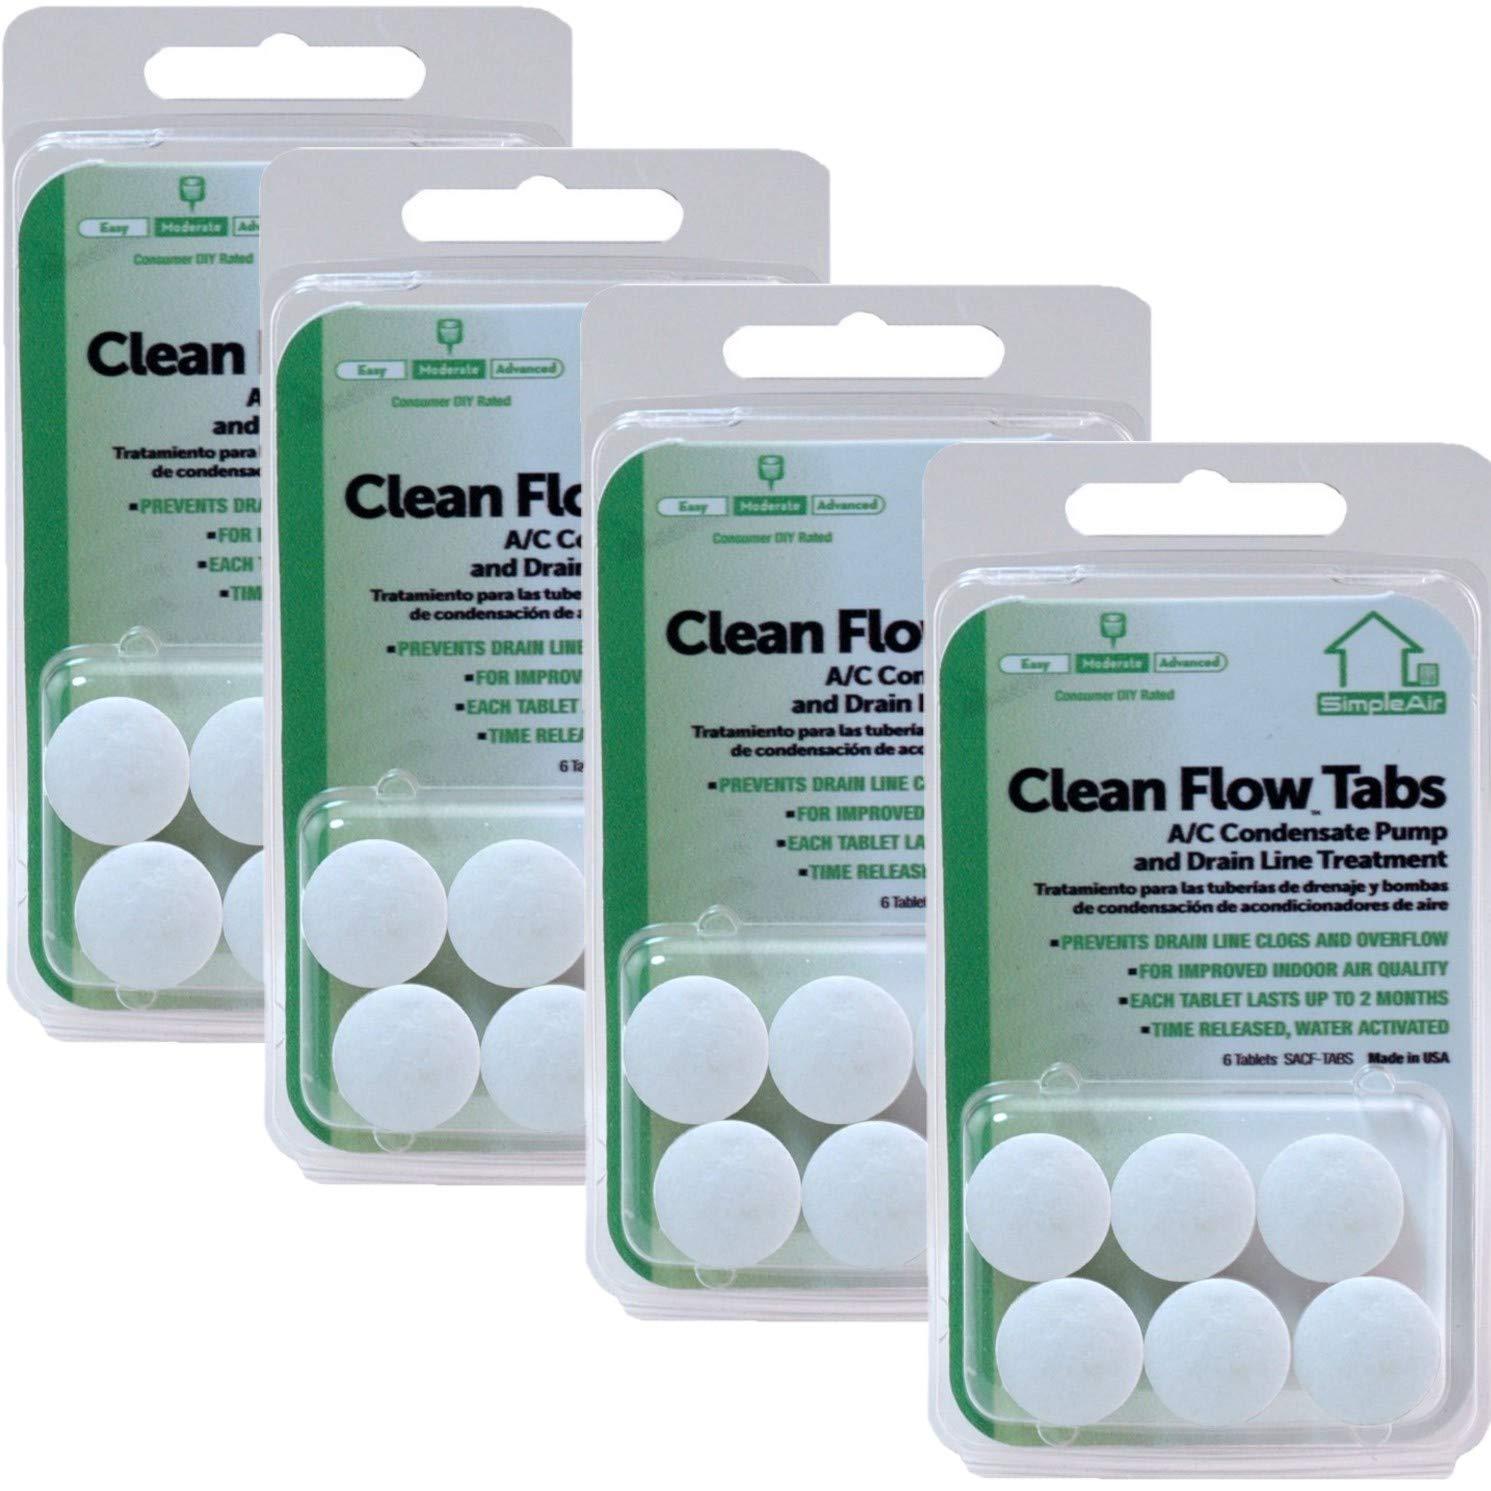 SimpleAir Clean Flow HVAC Drain Line Treatment Tabs, 6 pk, Pack of 4 (Total 24 Tablets)